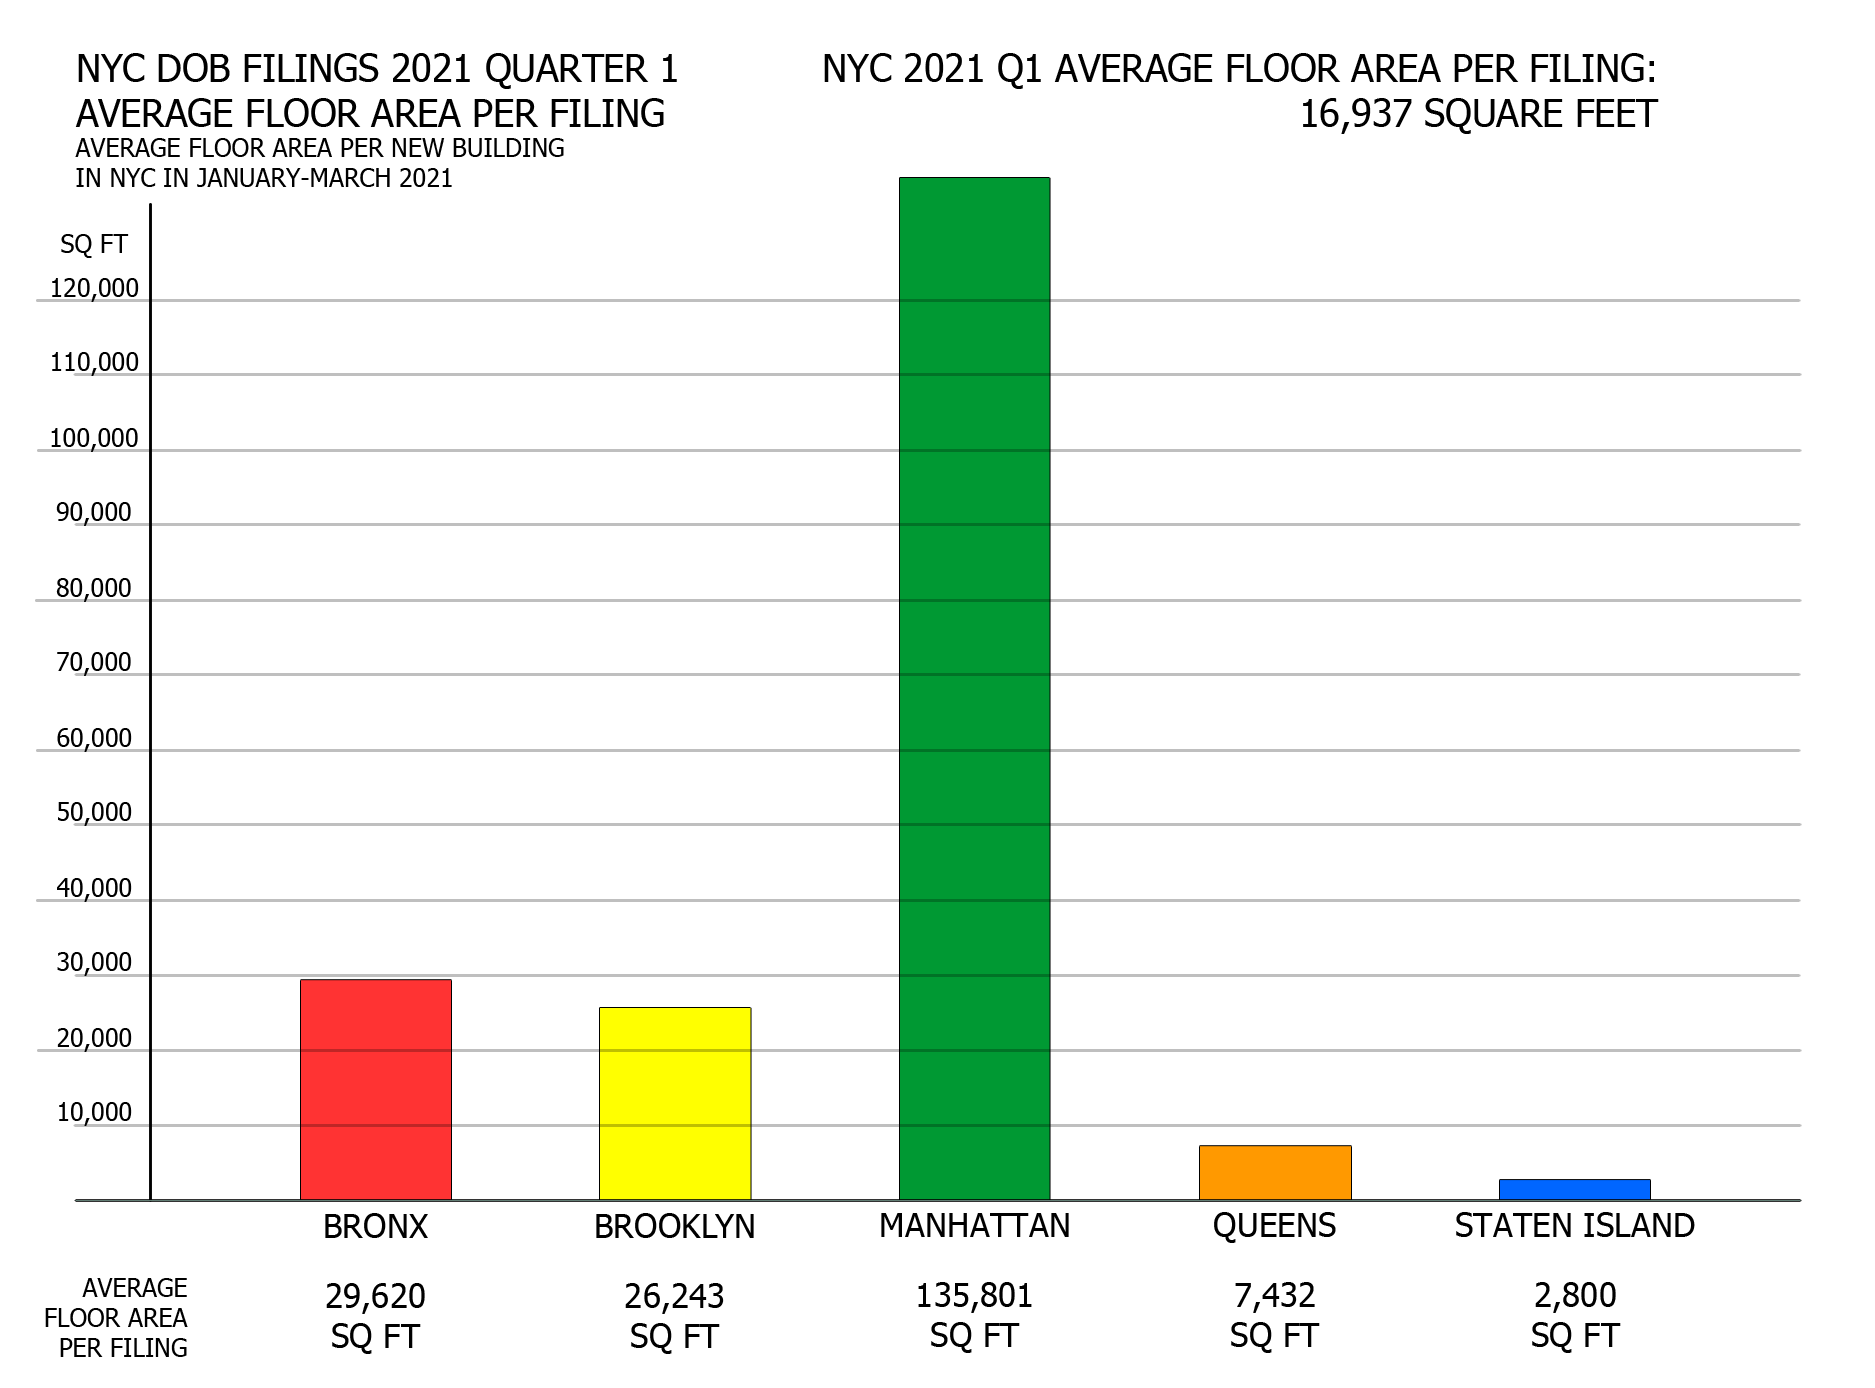 NYC DOB filings in first quarter of 2021 by average floor area per filing per borough. Credit: Vitali Ogorodnikov